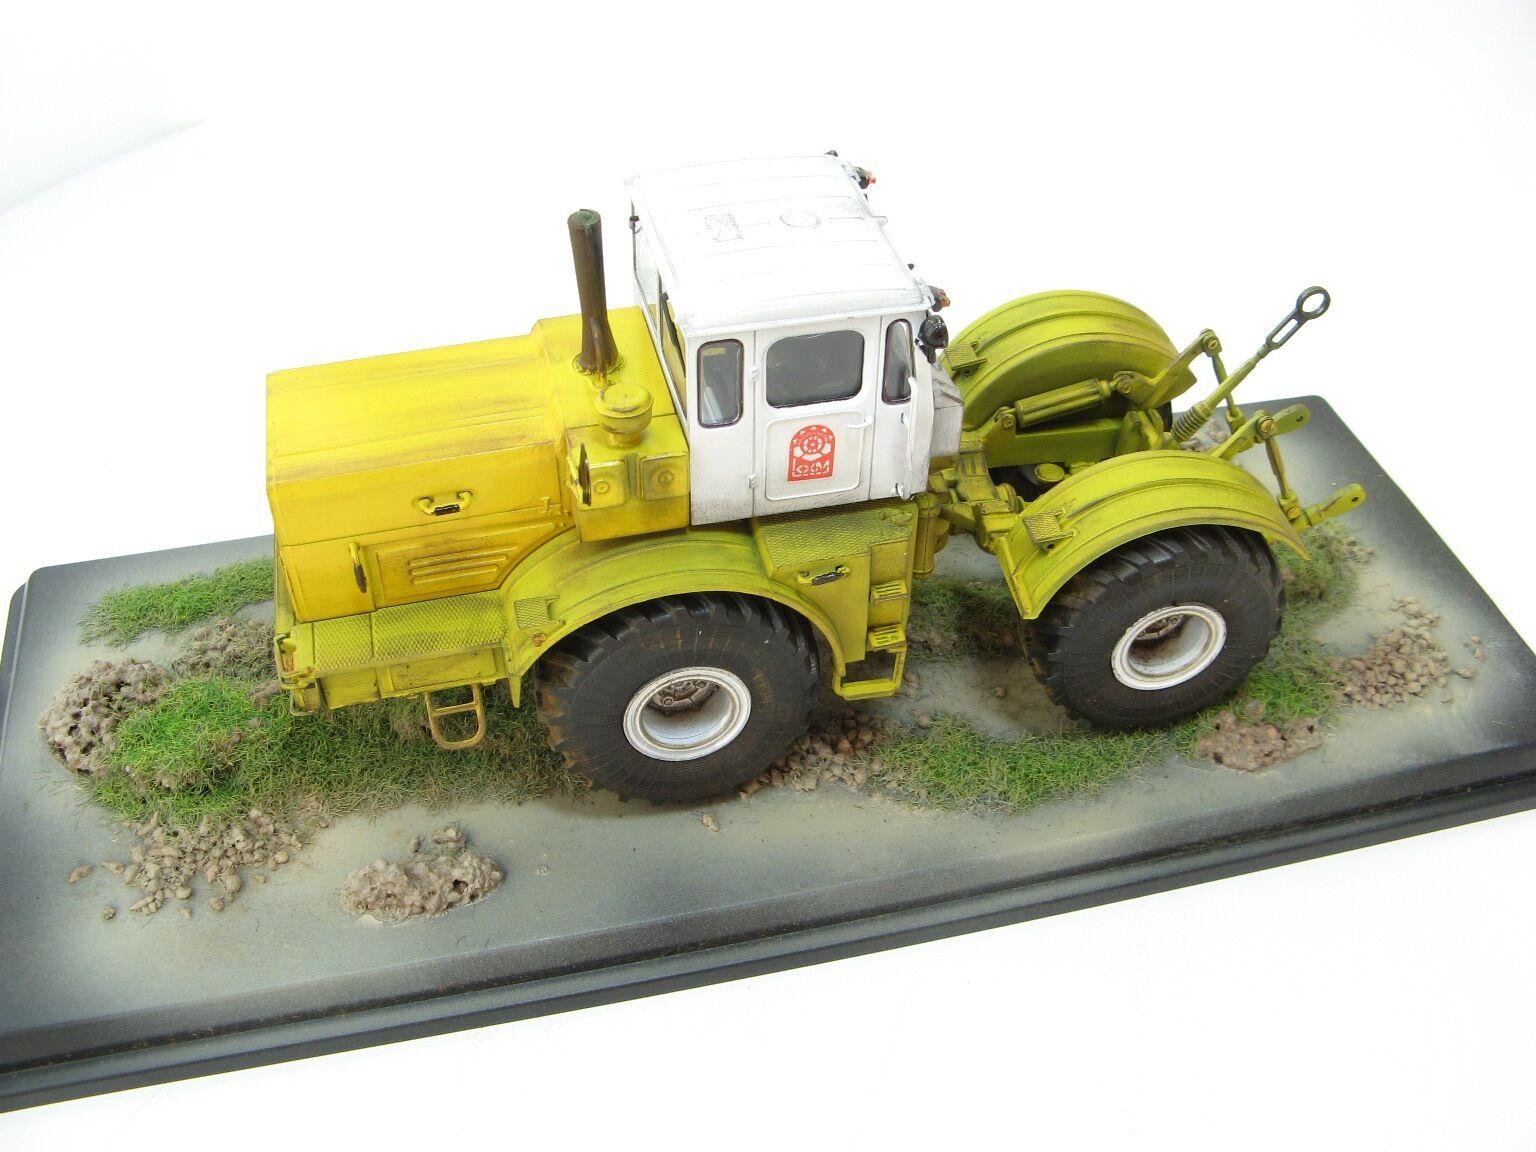 Кировец К-701     Kirovets K-701 tractor Nostalgie SSM 1 43 exclusive L.E. a292d3